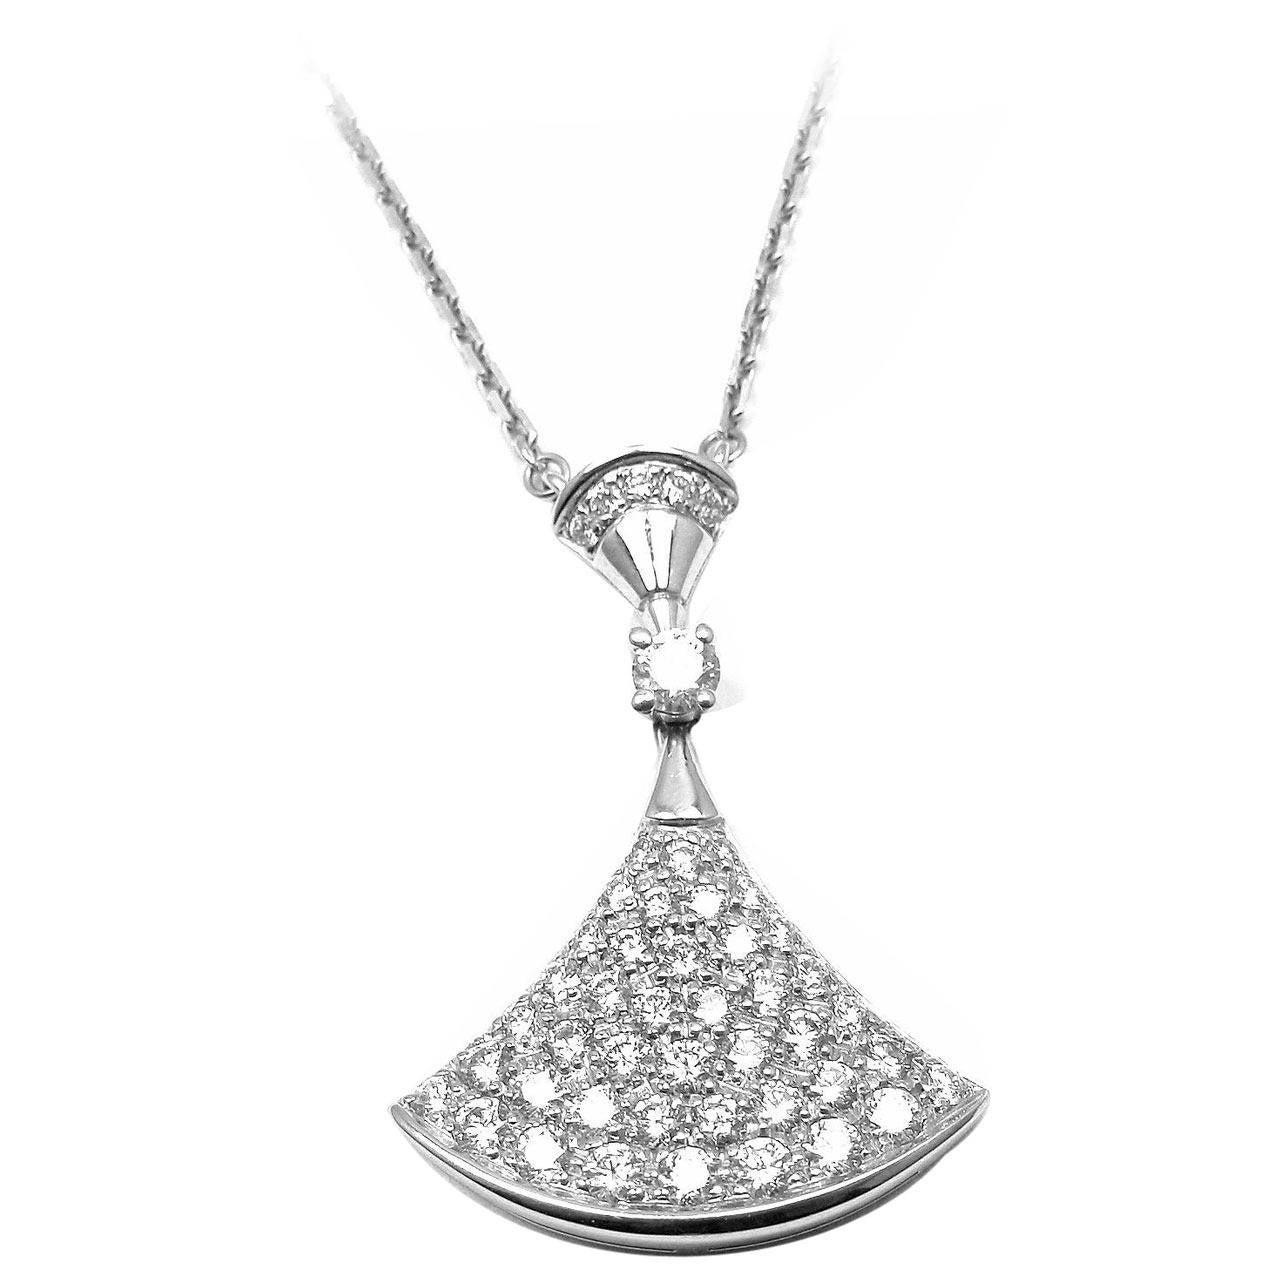 fashion chain necklace